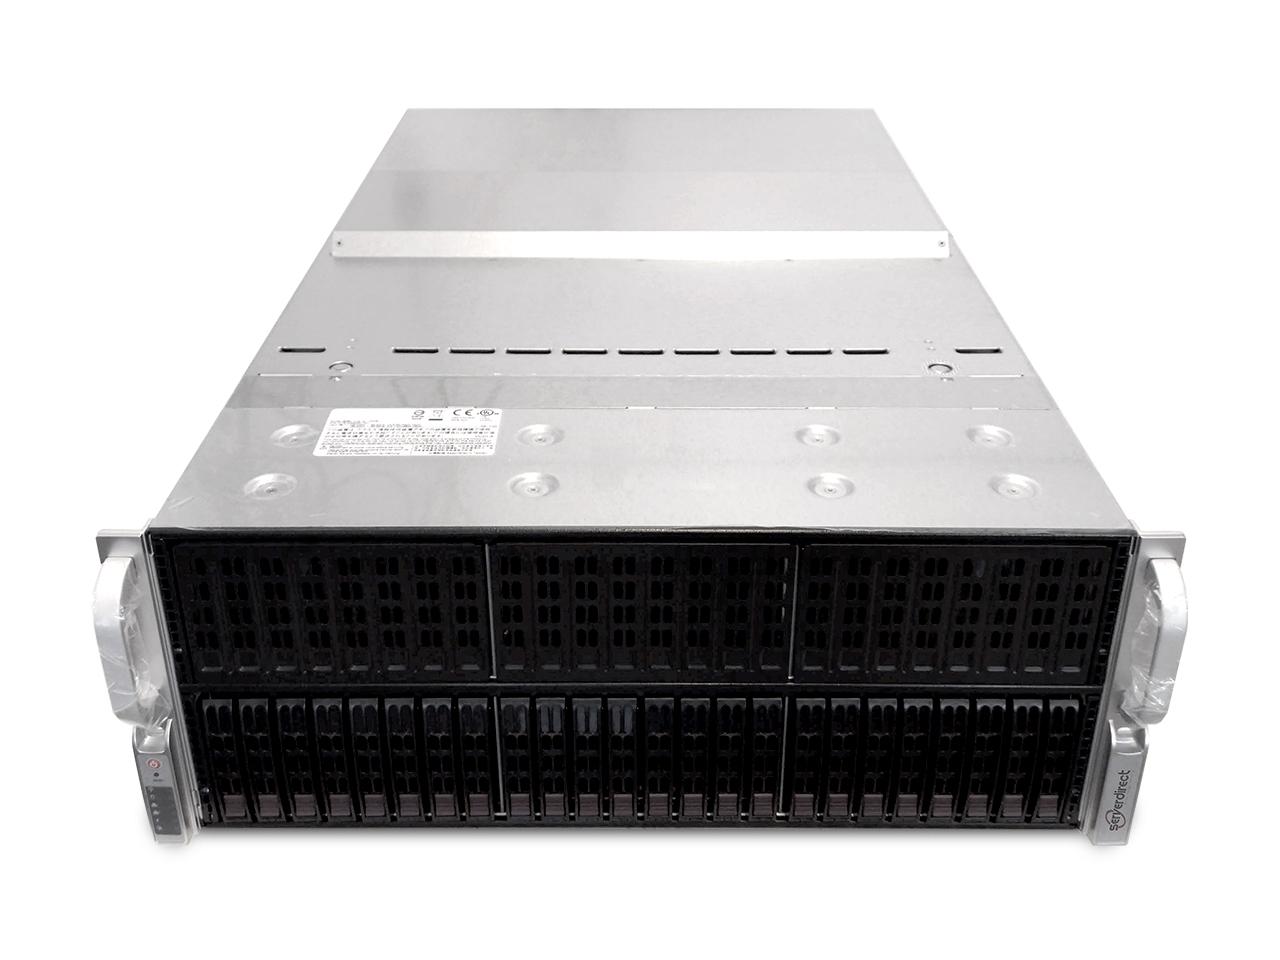 ServerDirect 4U GPU Server, 8 GPU's, 8x 16GB DDR4, 2x Intel Xeon E5-2697V4, 1x 256GB Storage (Configureerbaar)